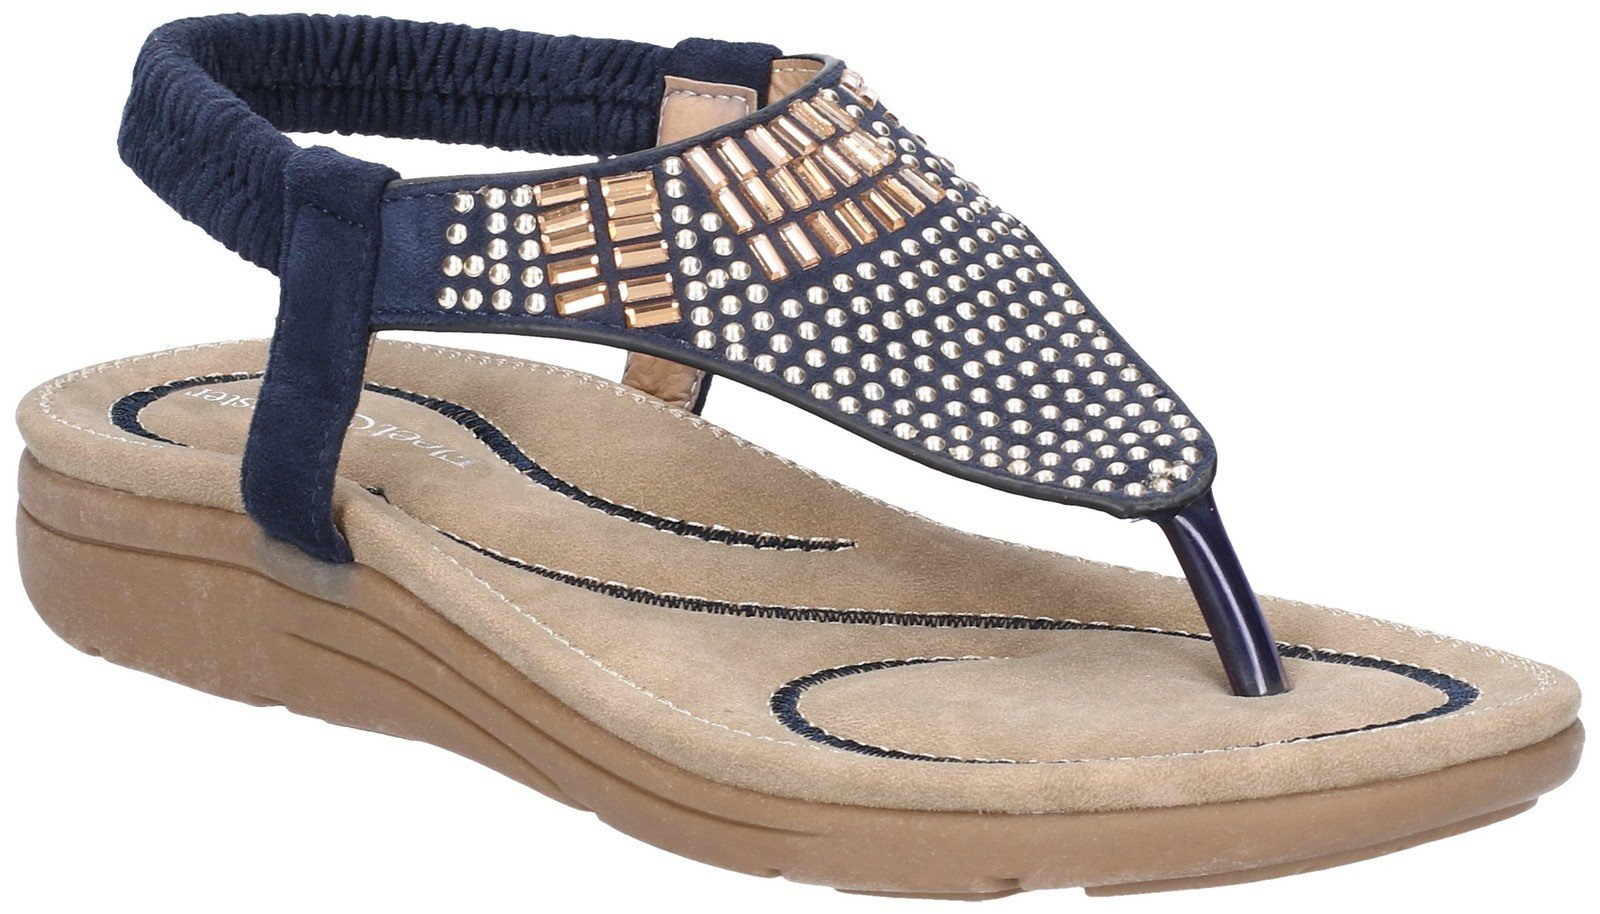 Fleet & Foster Women's Mulberry Elastic Sandal Various Colours 28277 - Navy 3